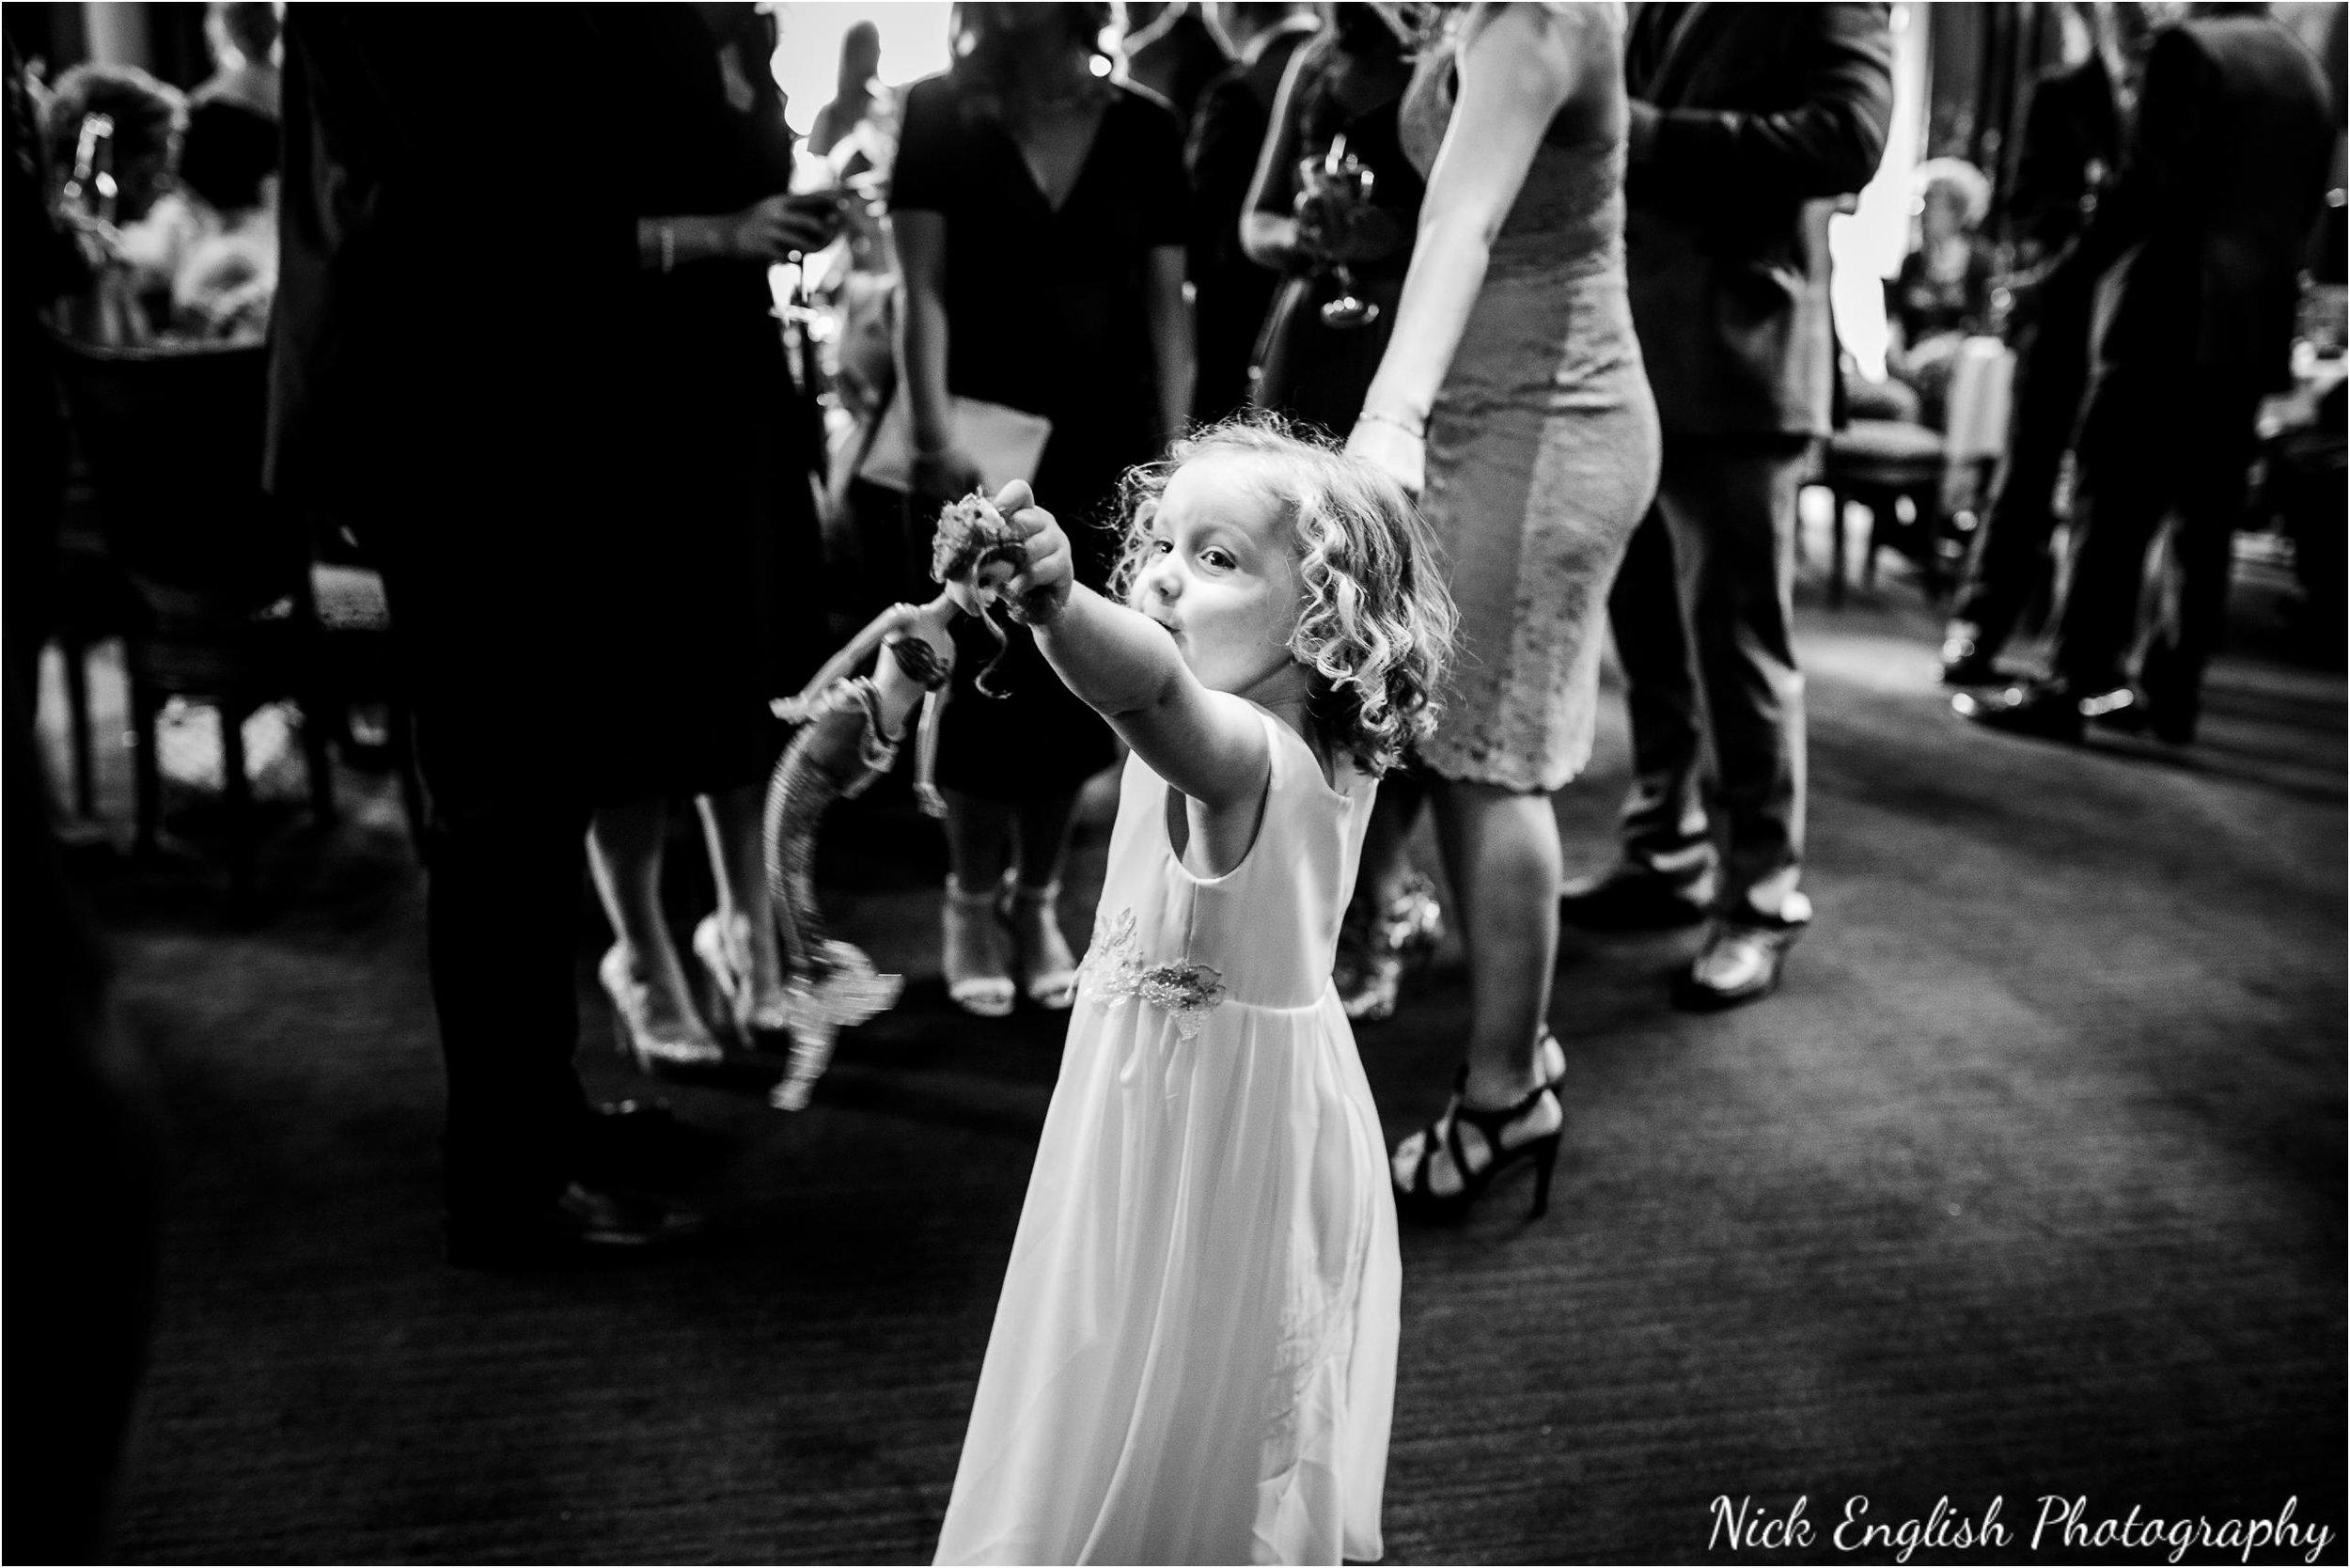 Stacey-Ash-Wedding-Photographs-Stanley-House-Preston-Lancashire-137.jpg